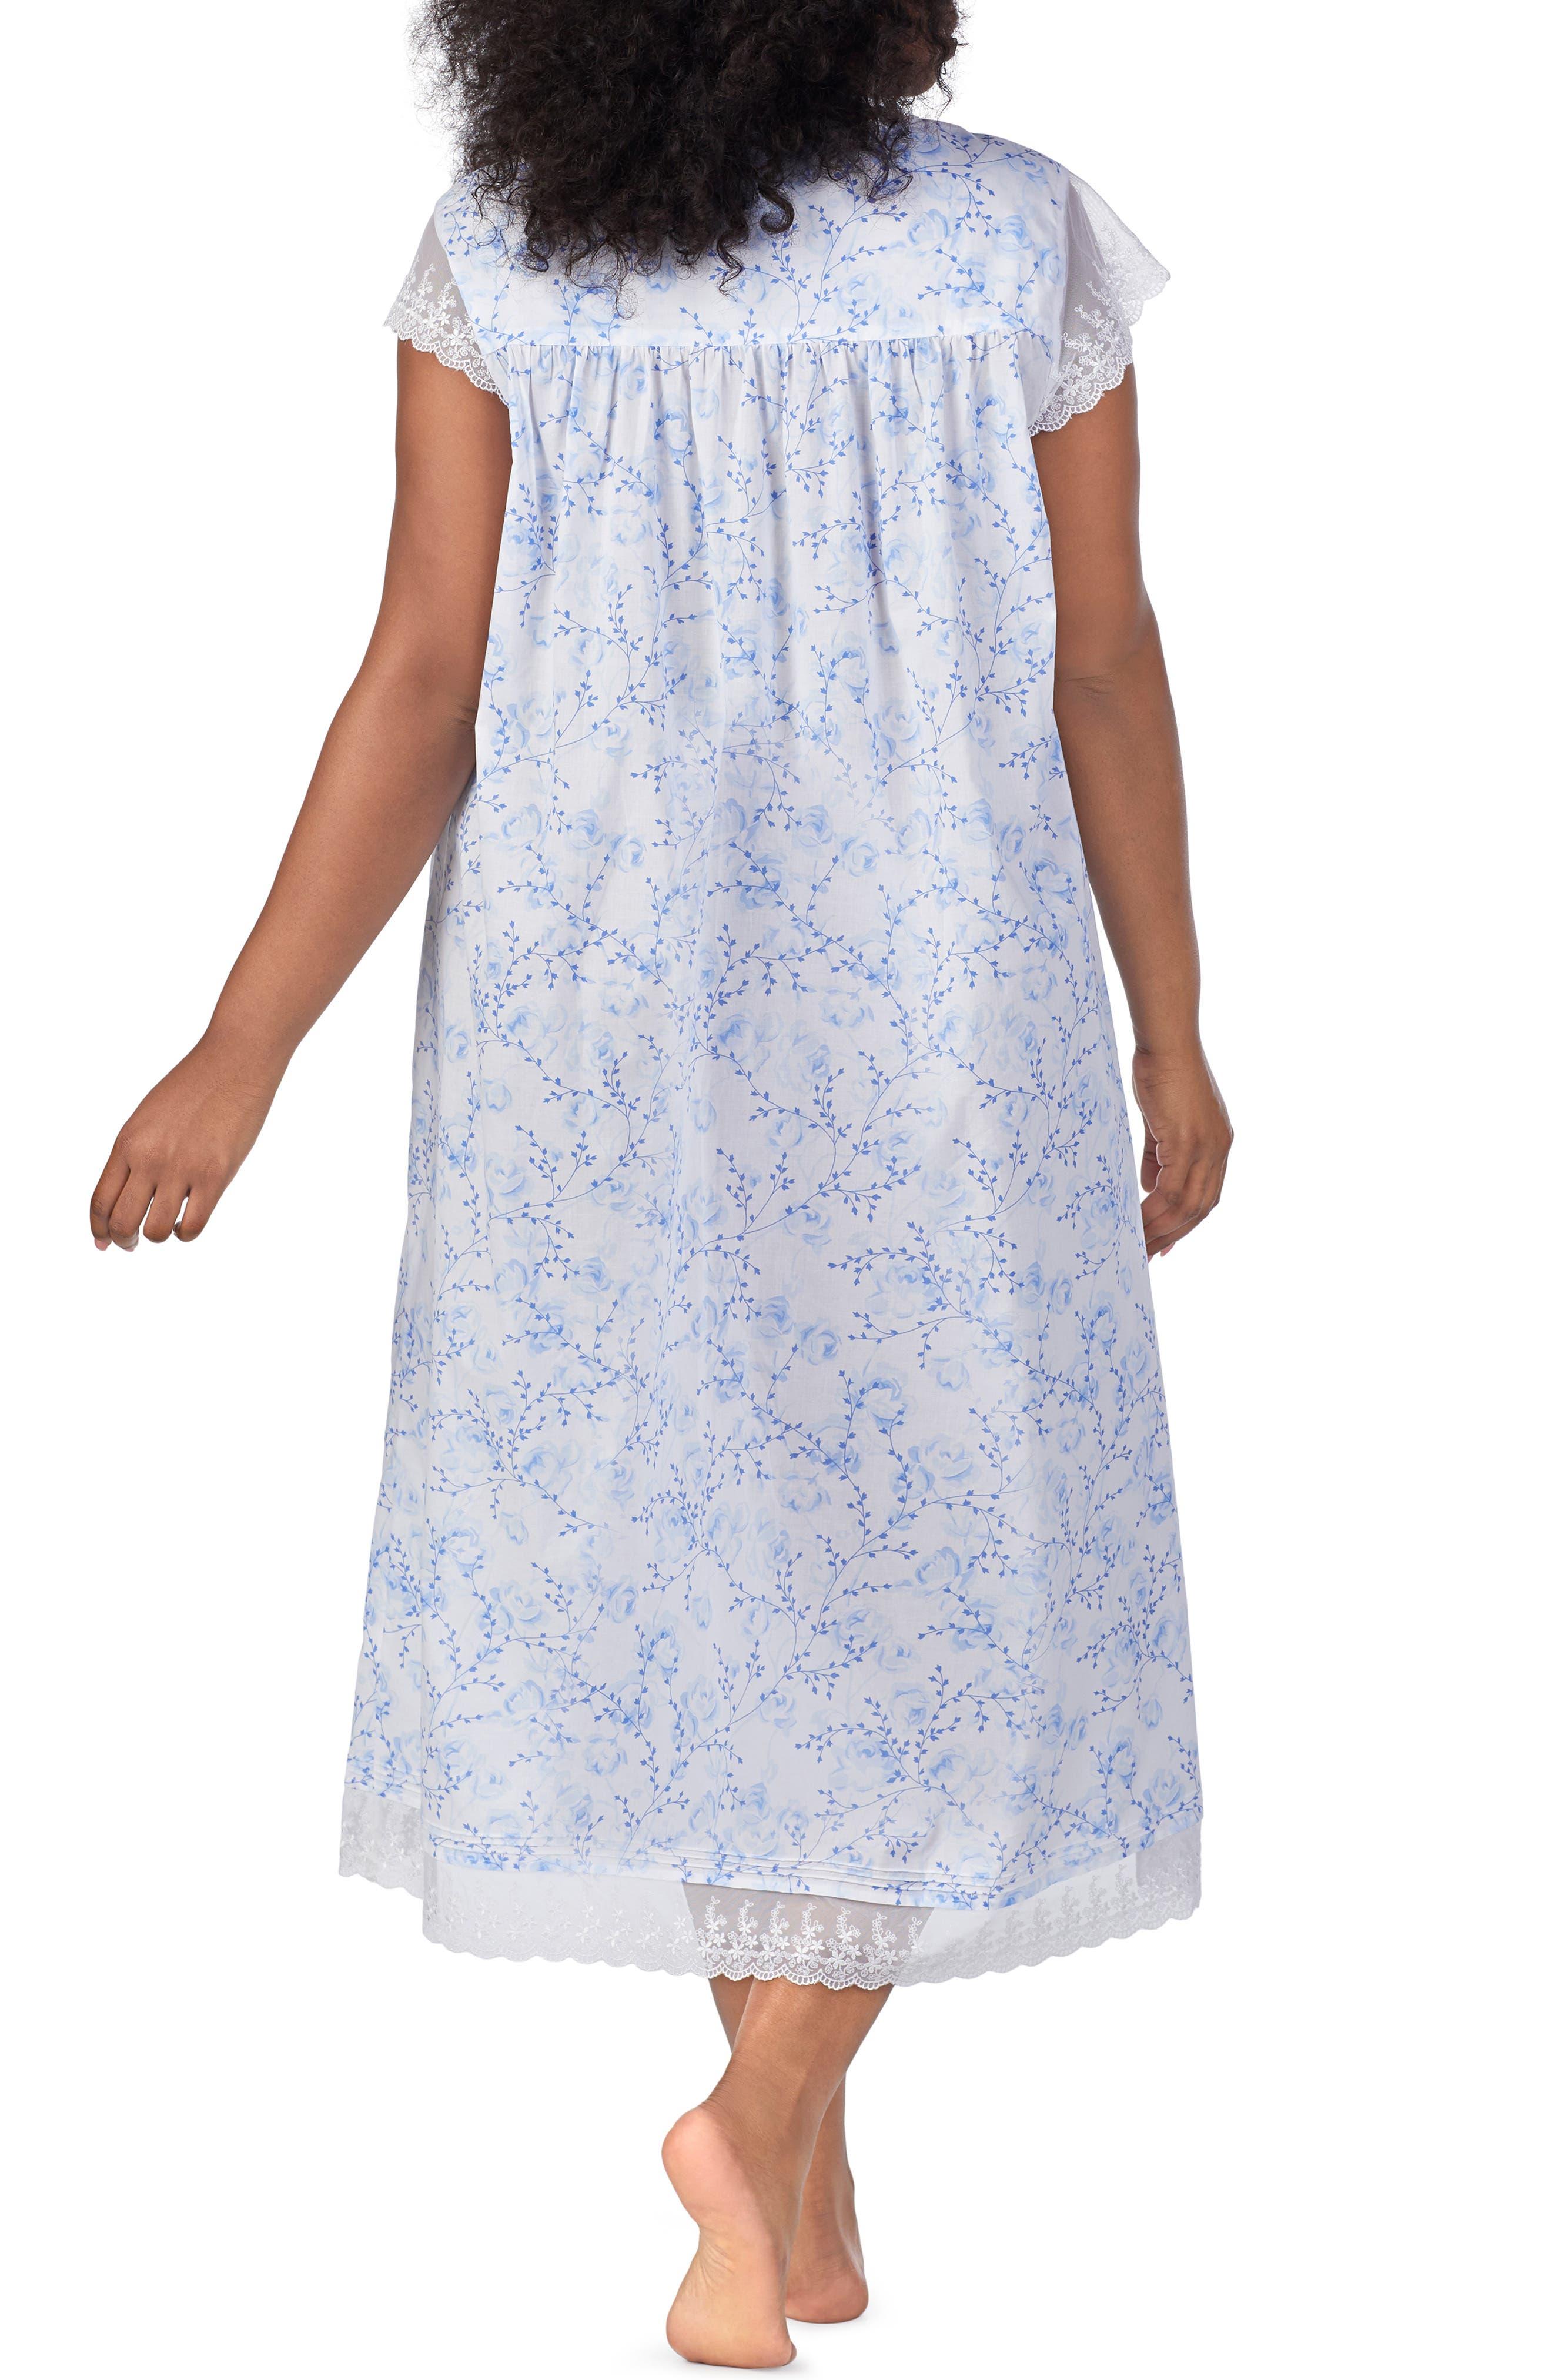 Cotton Lawn Nightgown,                             Alternate thumbnail 2, color,                             BLUE FLORAL